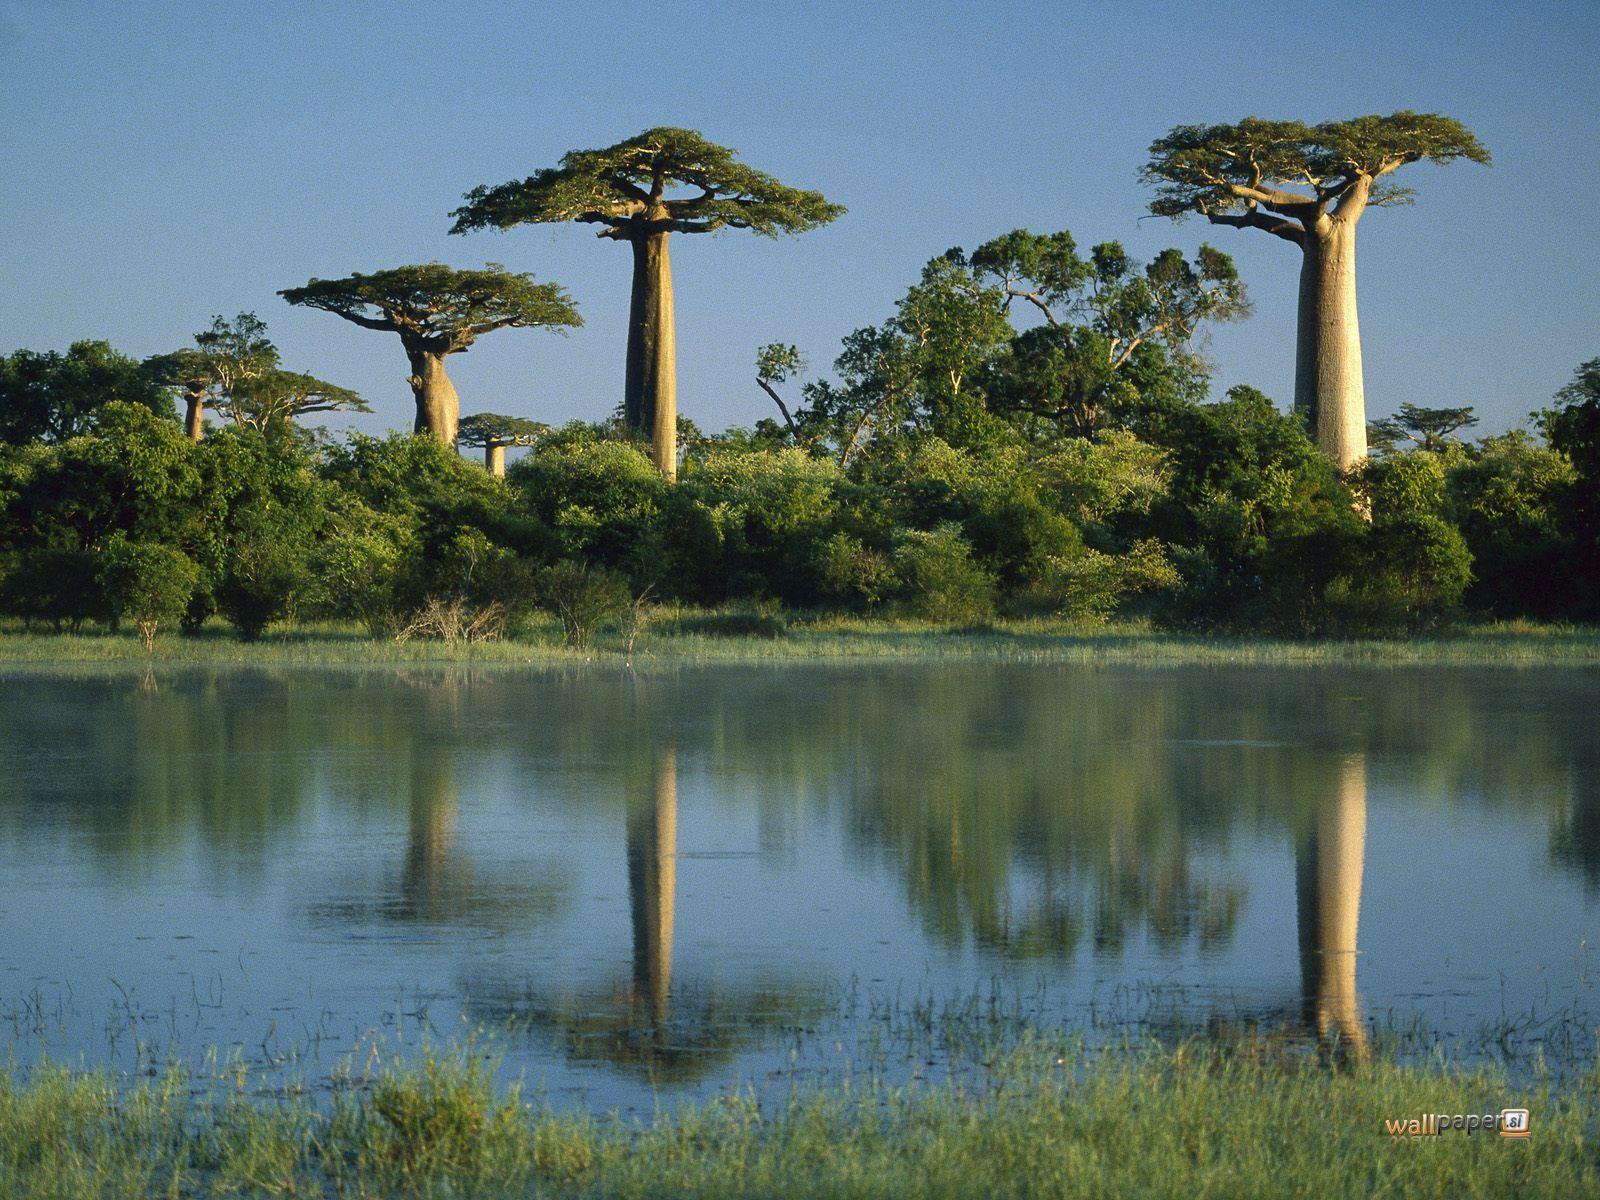 http://3.bp.blogspot.com/-4Nqvuz916mw/TmePzpcX31I/AAAAAAAAAQw/VSQ-e8jY-uw/s1600/Baobab-Trees-Reflected-in-Wetlands-Morondava-Madagascar-Wallpaper.jpg